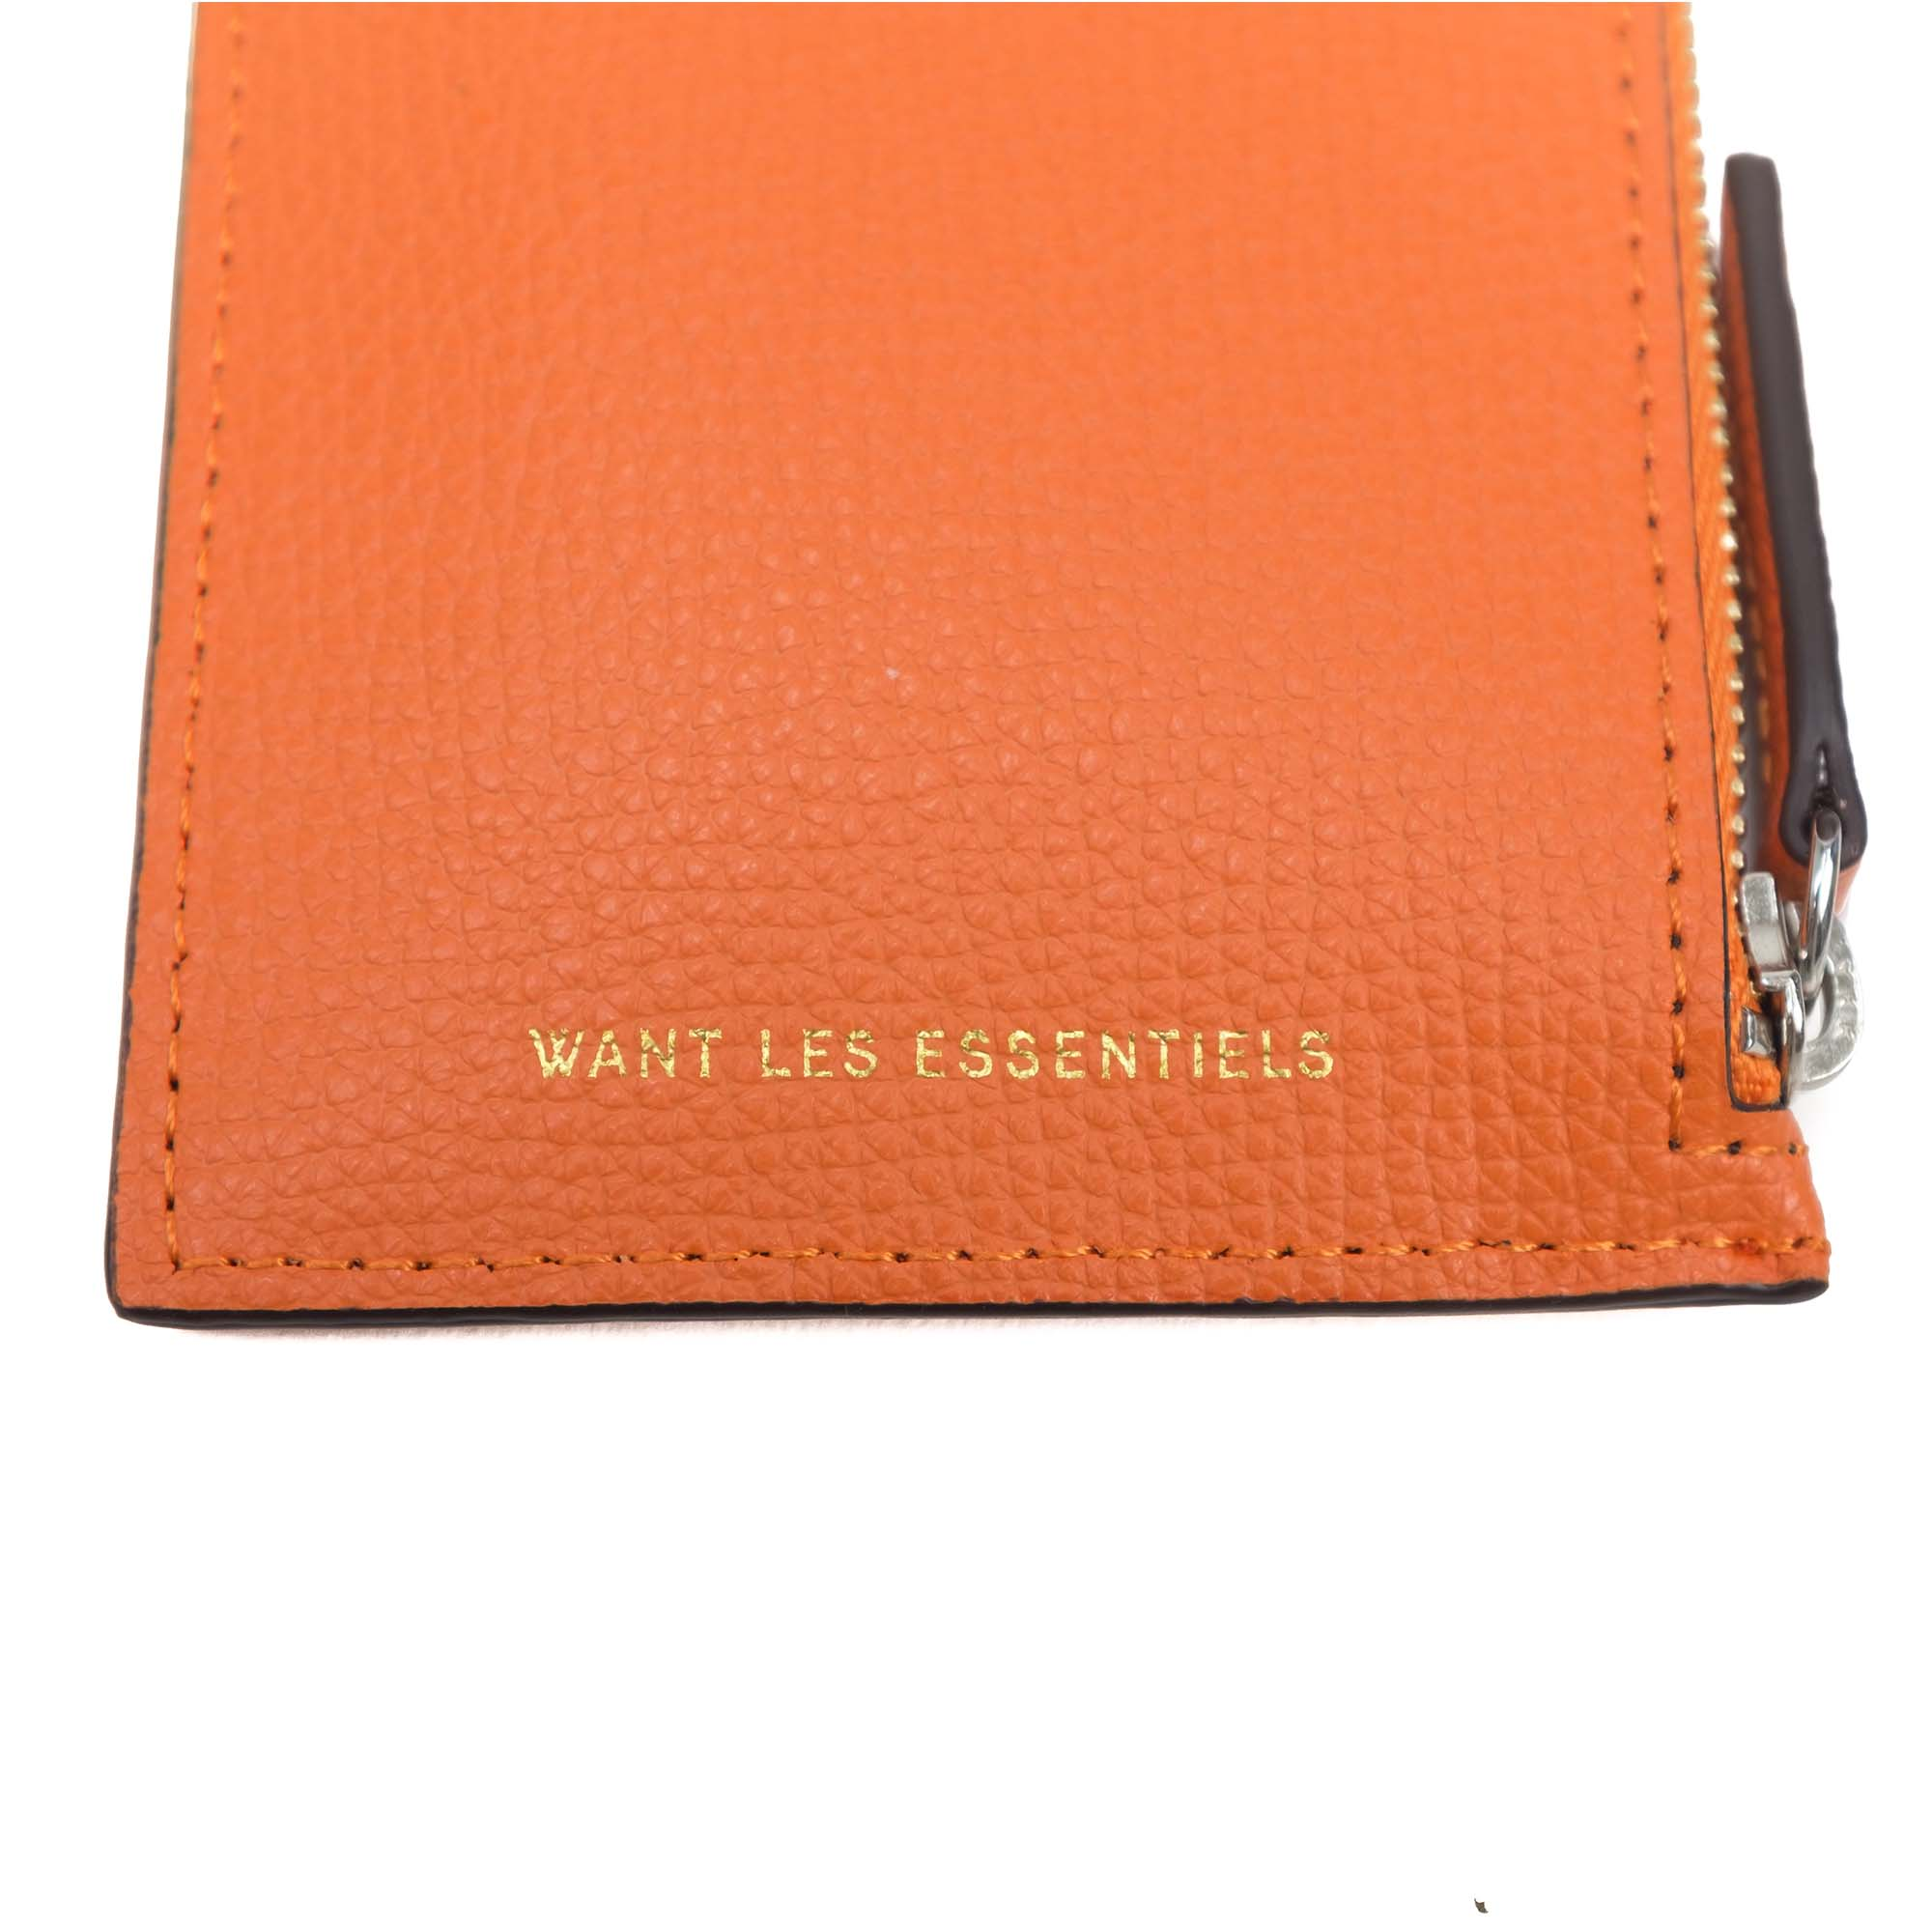 WANT Les Essentiels Adano Zipped Cardholder - Sunset grain